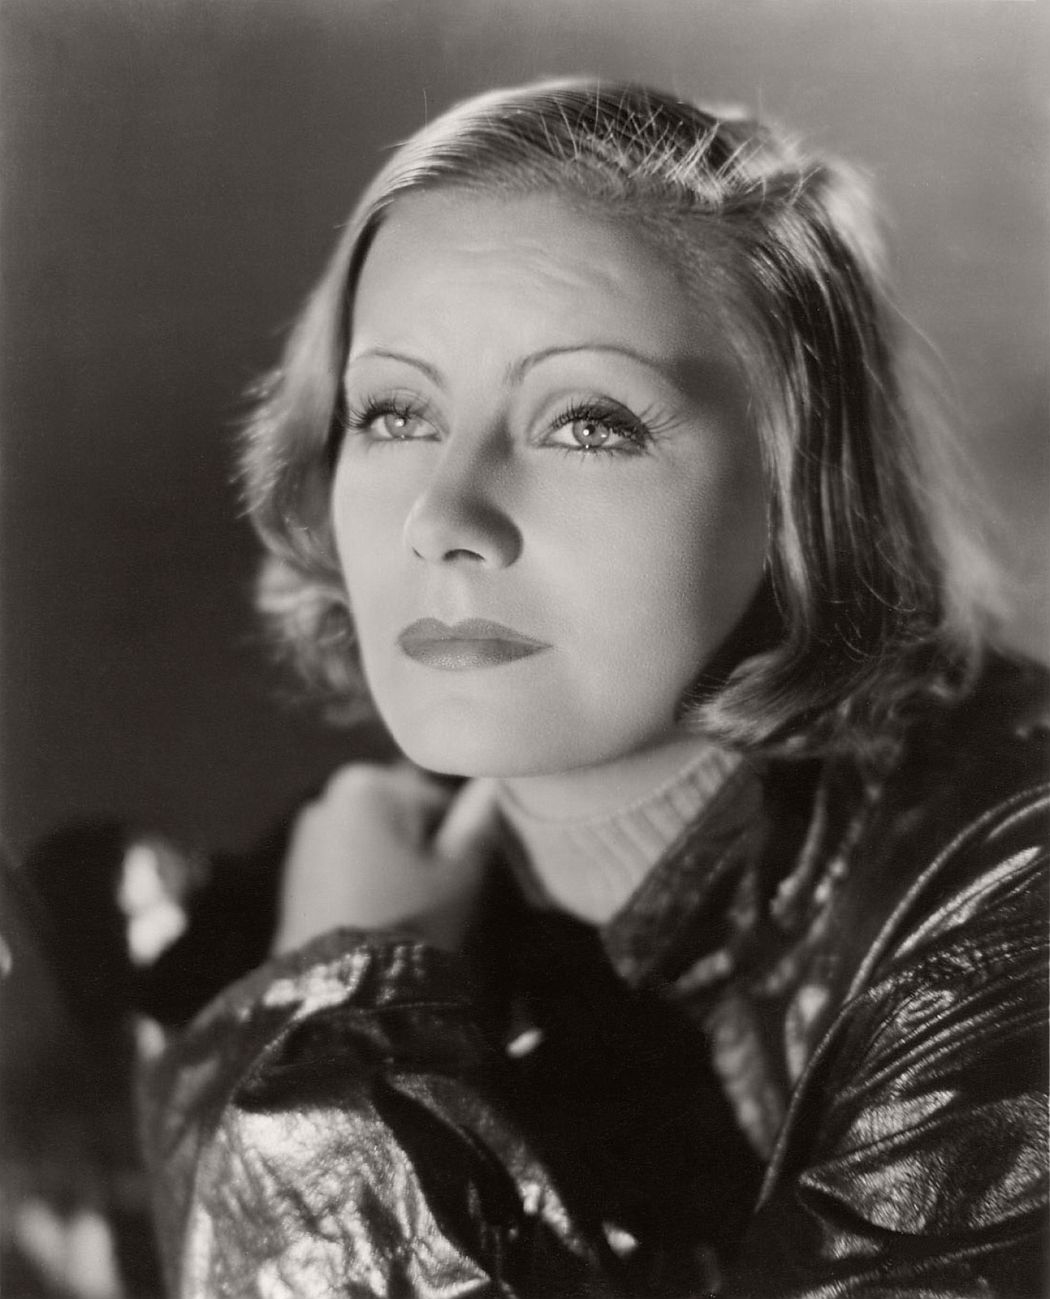 vintage-greta-garbo-portraits-1920s-1930s-02